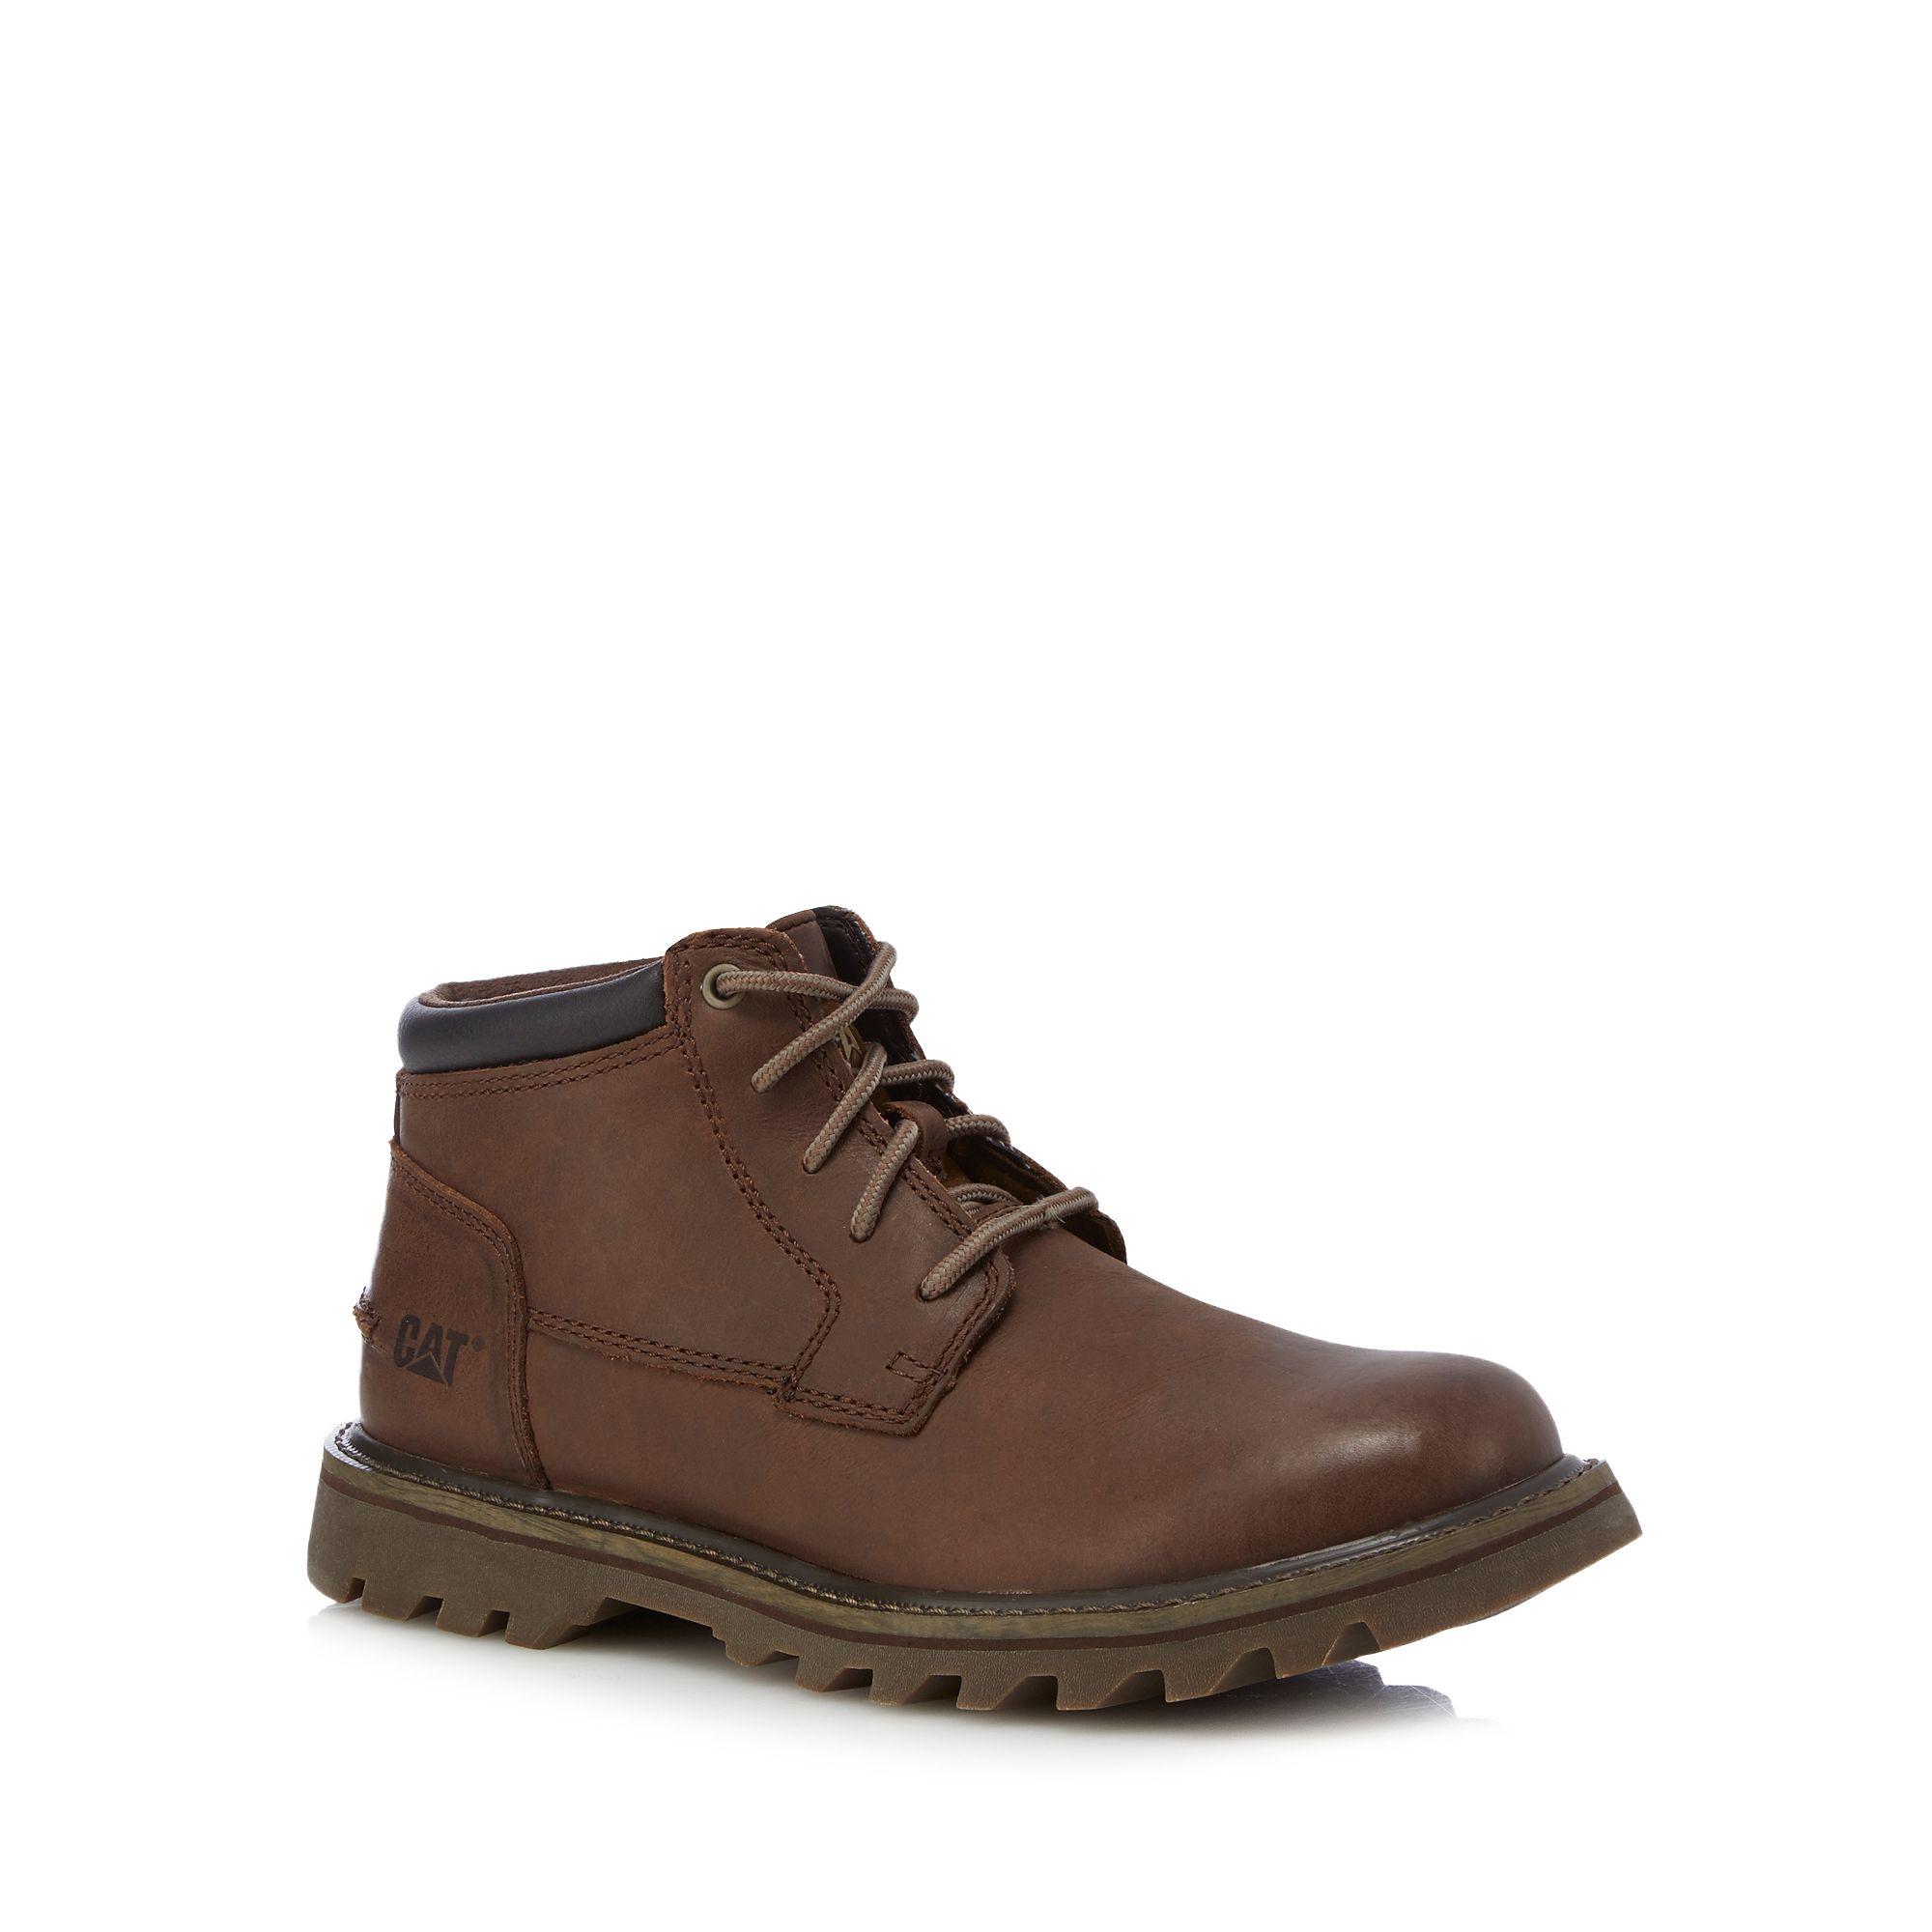 caterpillar mens brown doubleday chukka boots from